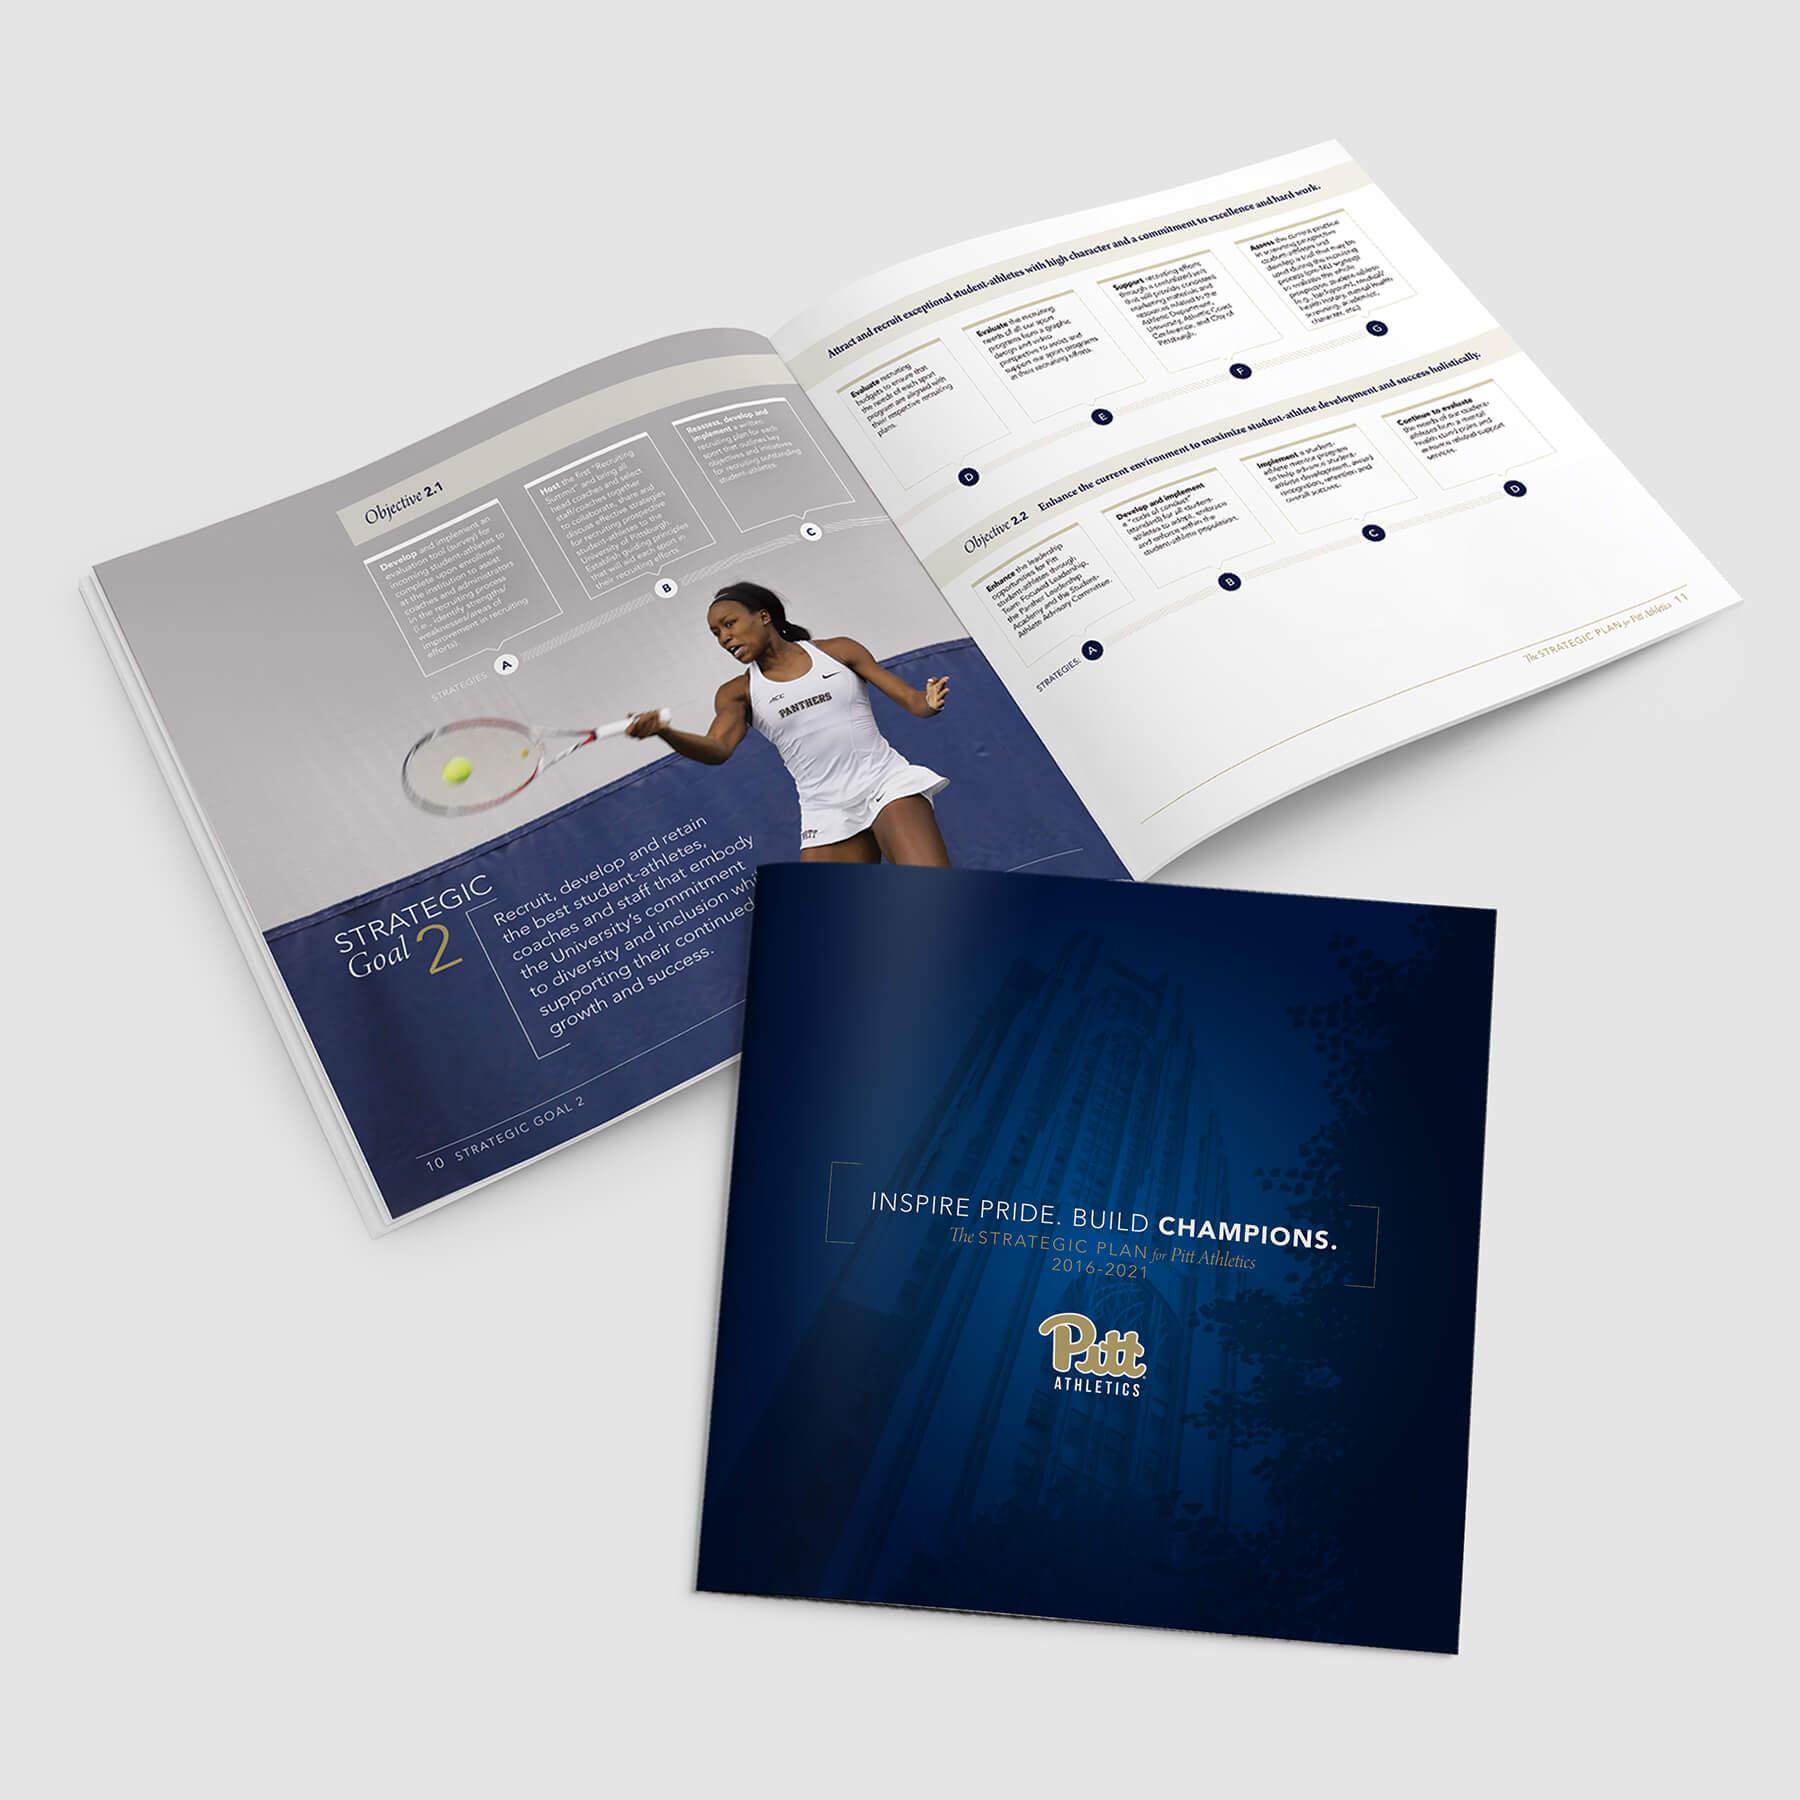 Graphic design for Pitt Athletics strategic planning guide